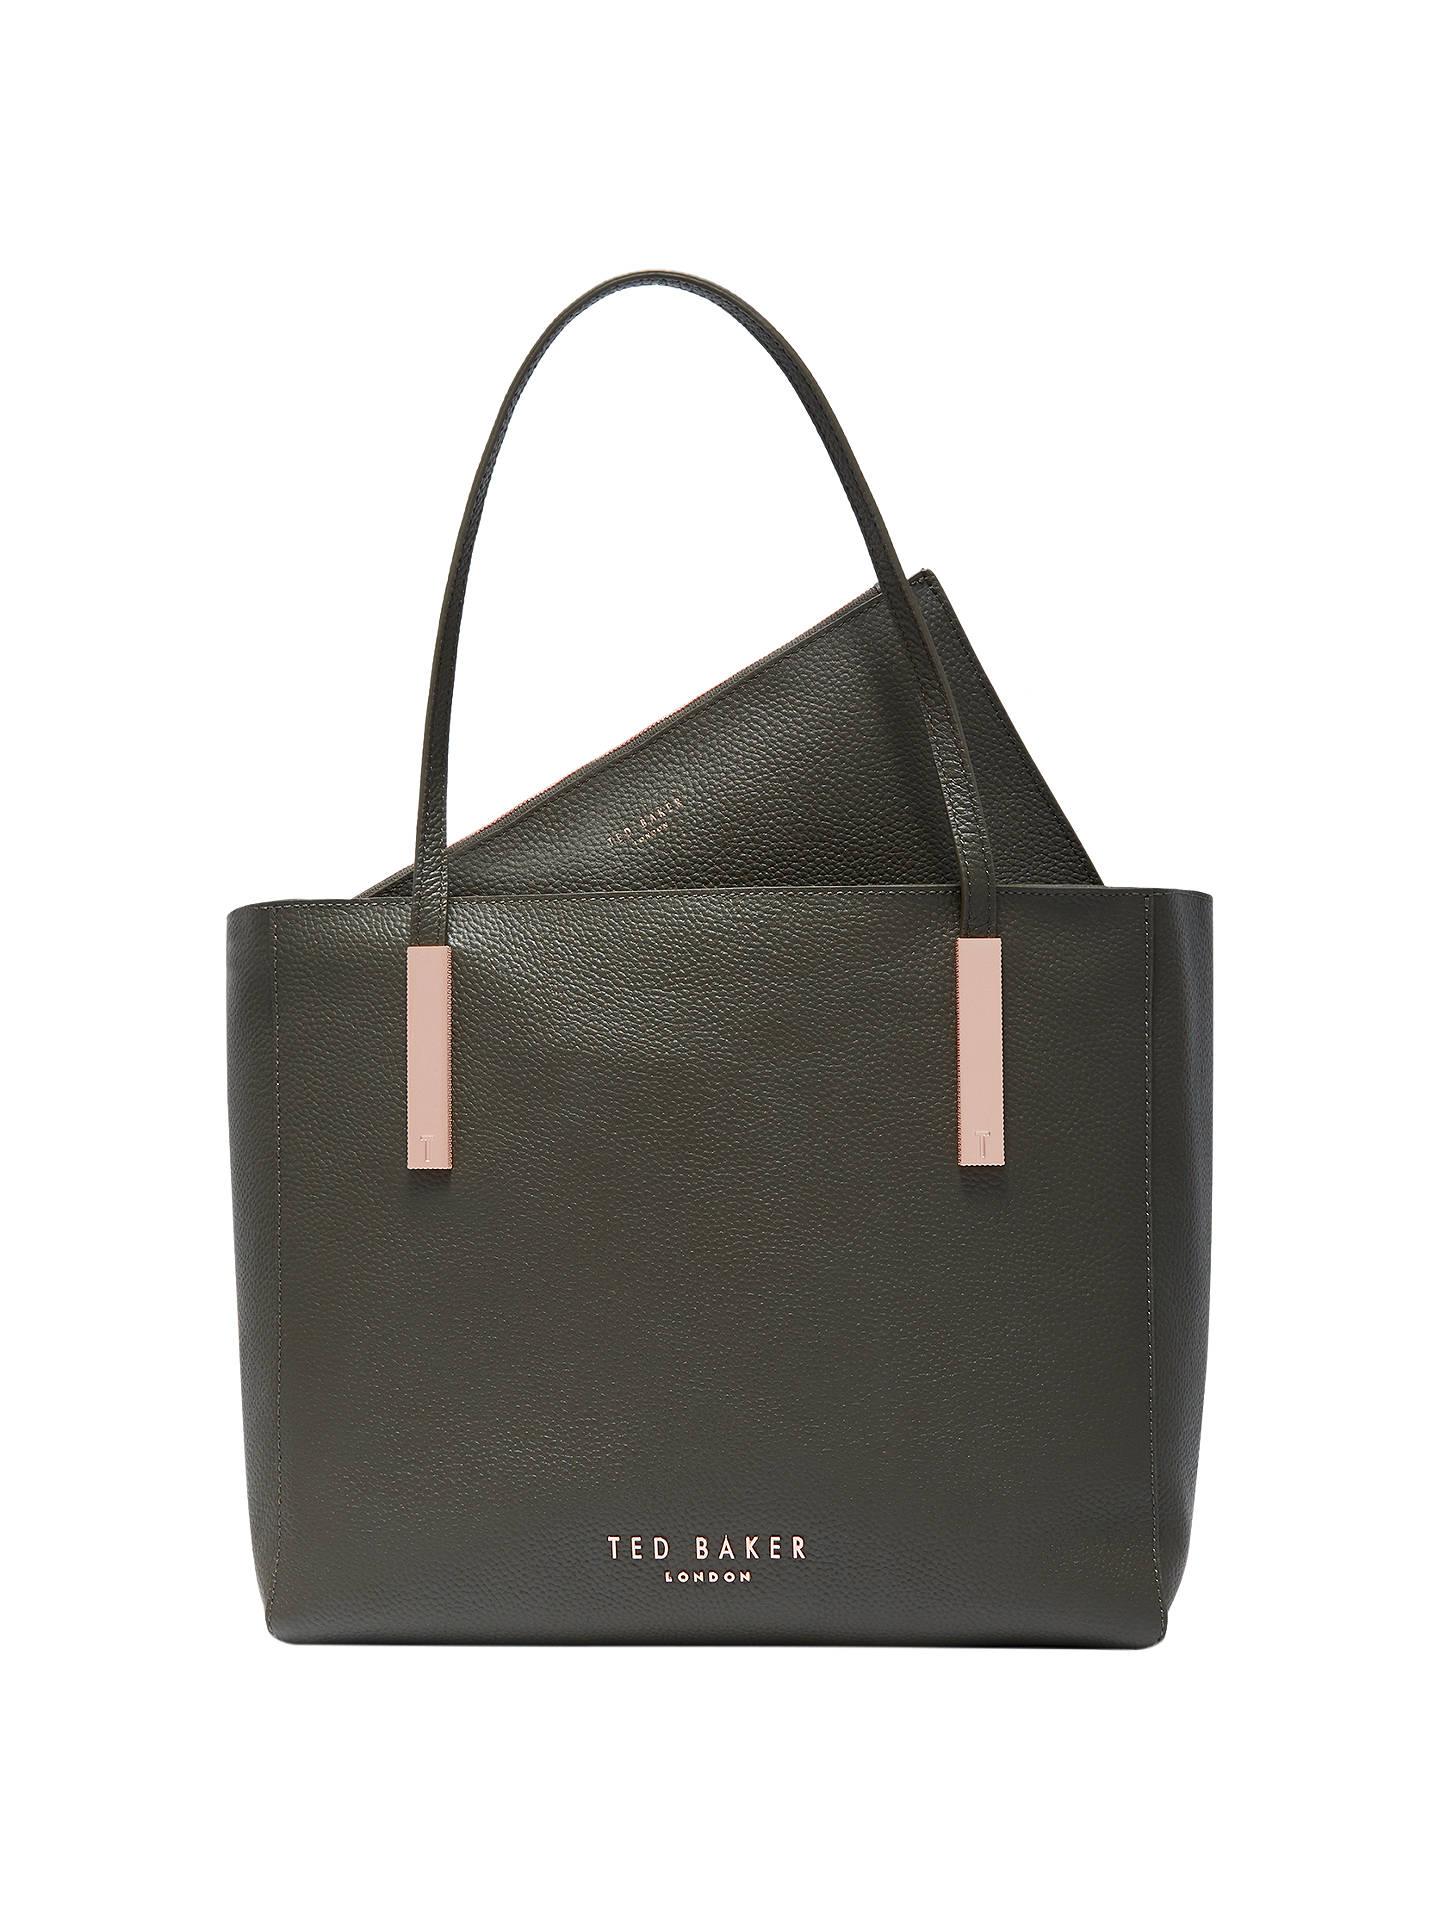 4afa5aee9832c Ted Baker Sarahh Leather Shopper Bag at John Lewis   Partners